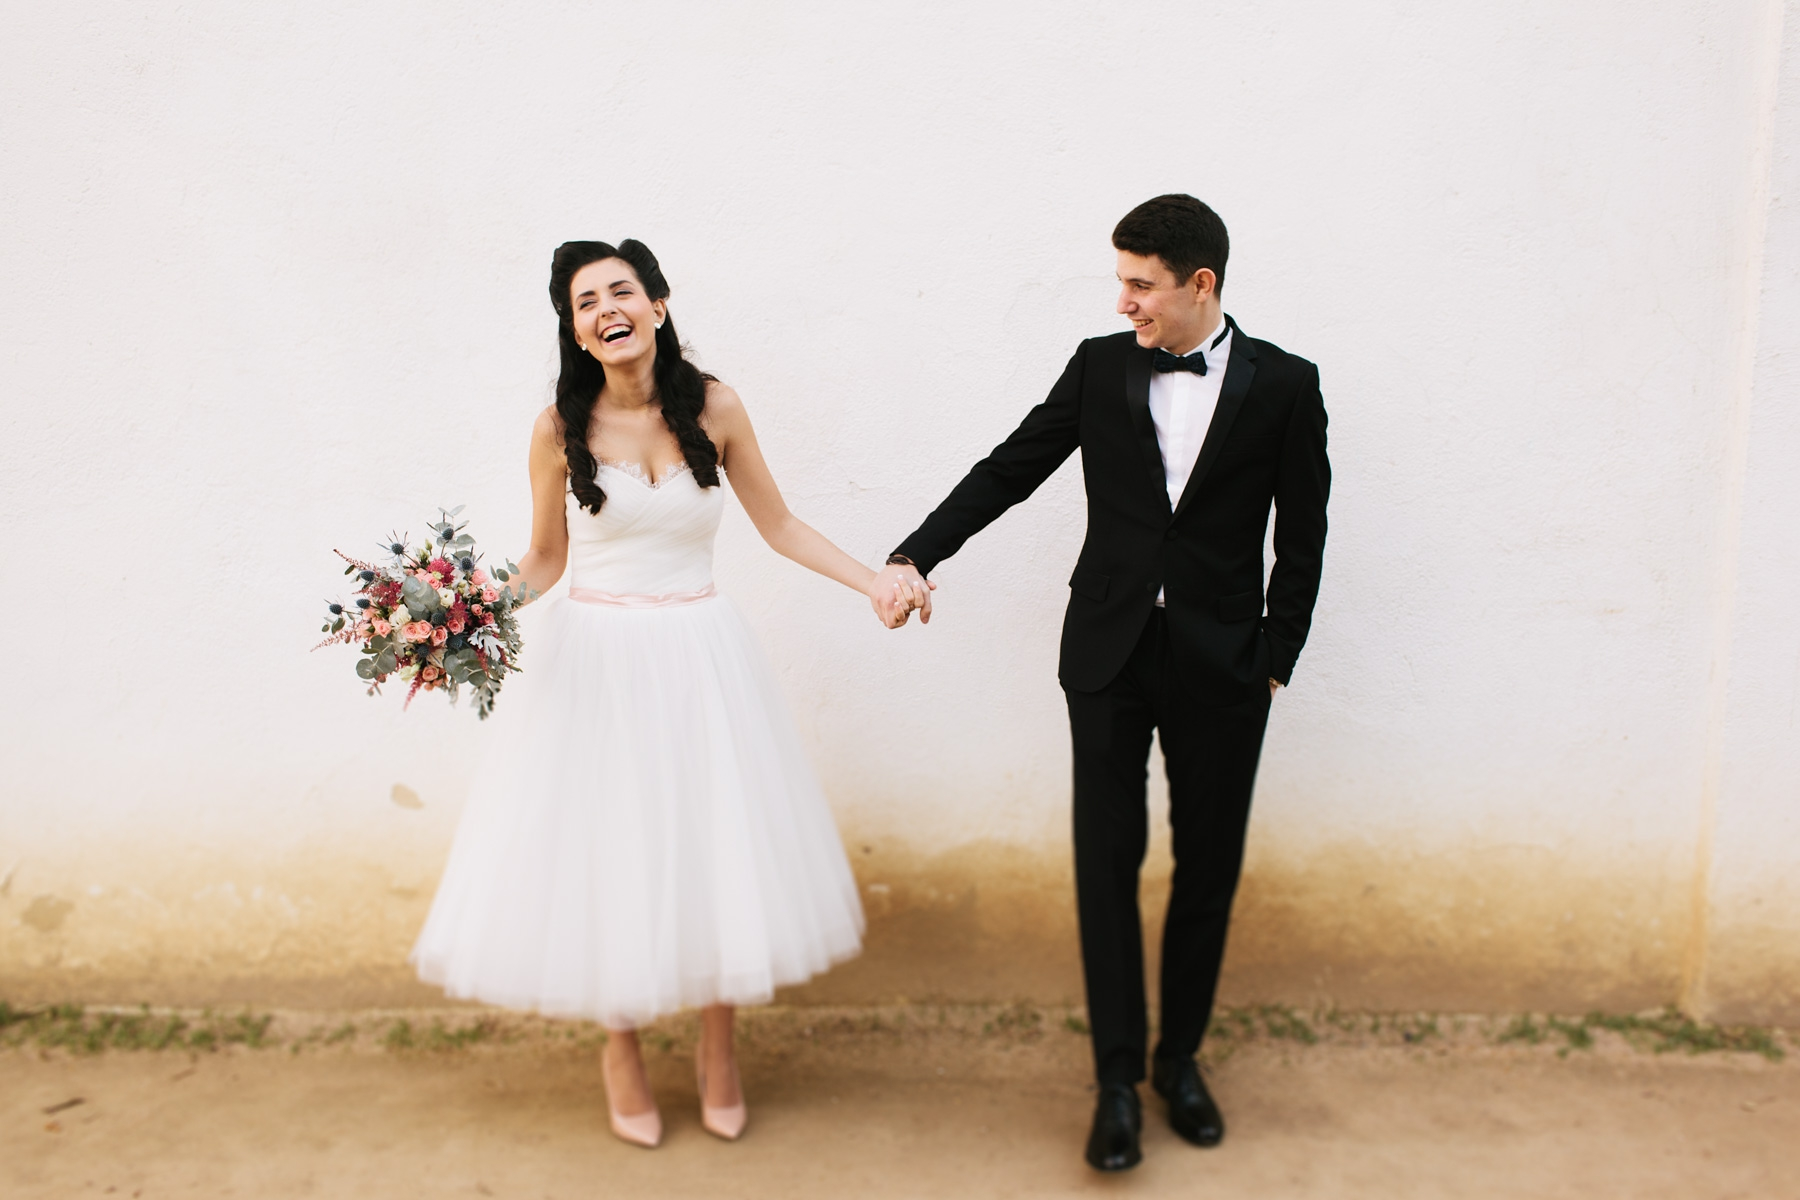 fotografo de bodas Jairo Crena-303